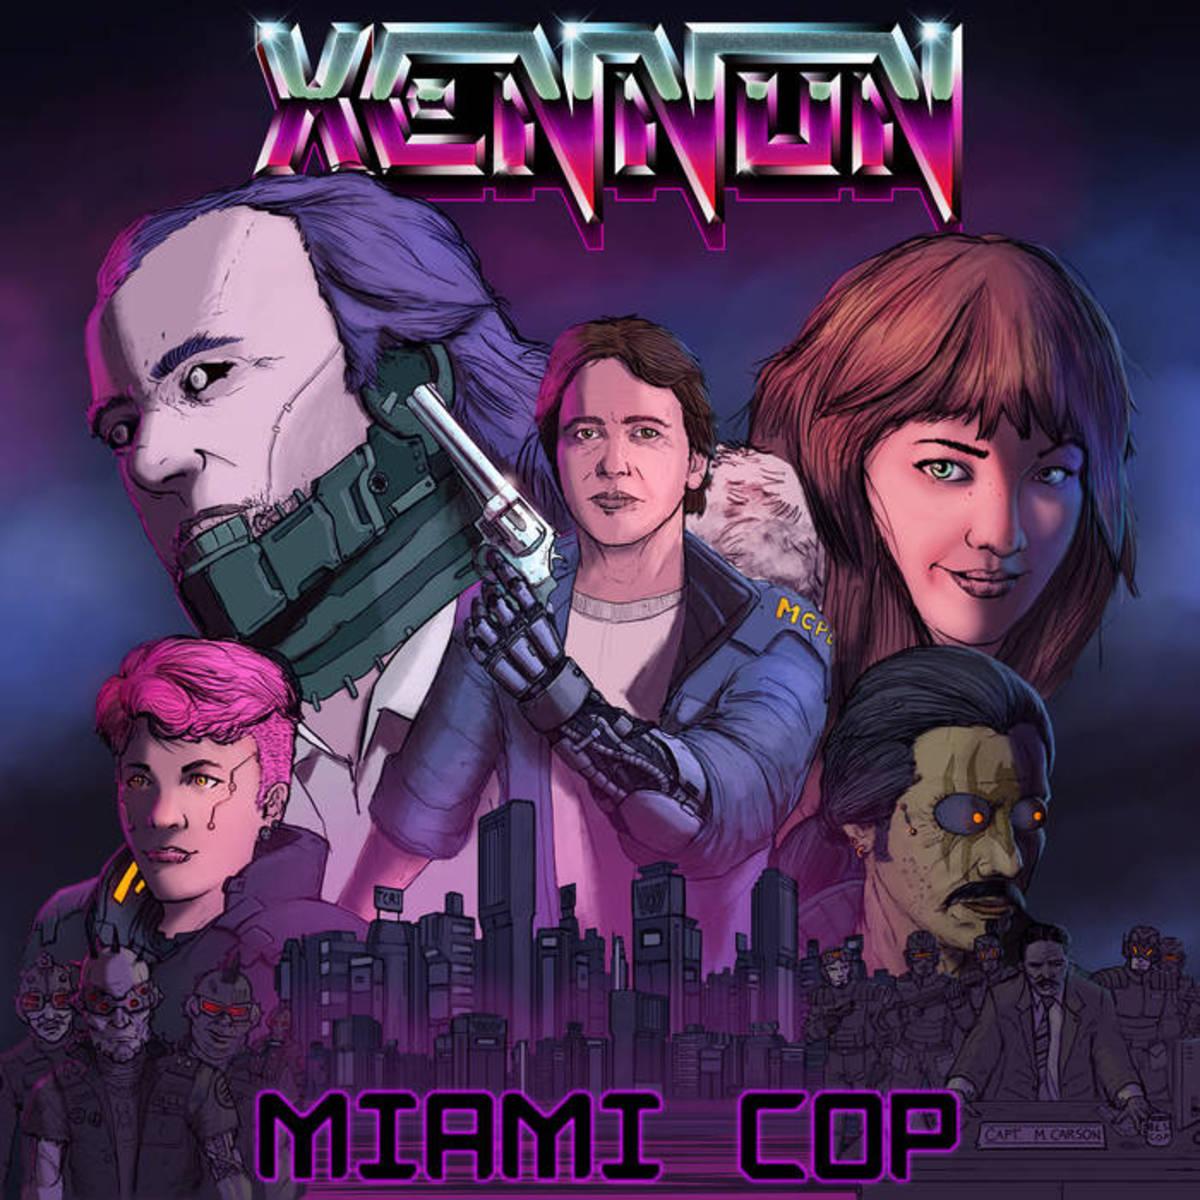 #synthfam Album Interview: MIAMI COP by XENNON